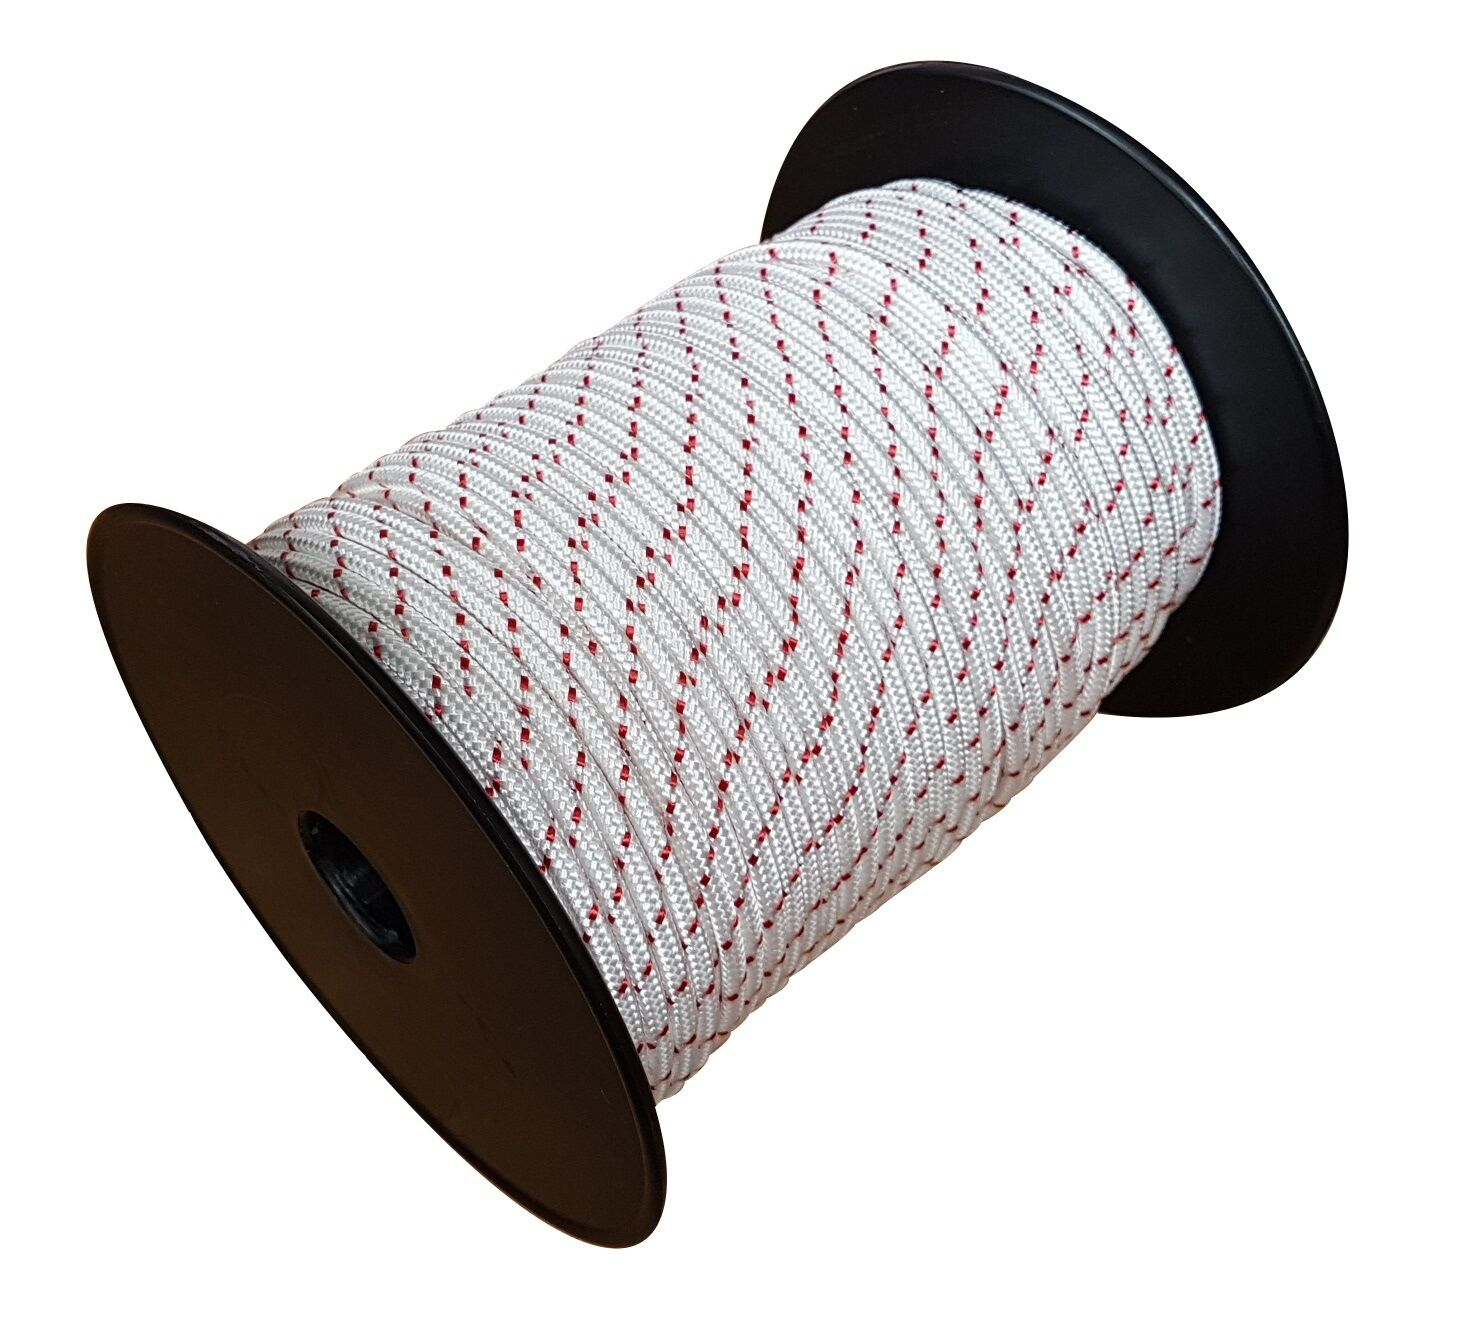 bowdenzug 200 cm s haken rasenm her seilzug f r. Black Bedroom Furniture Sets. Home Design Ideas